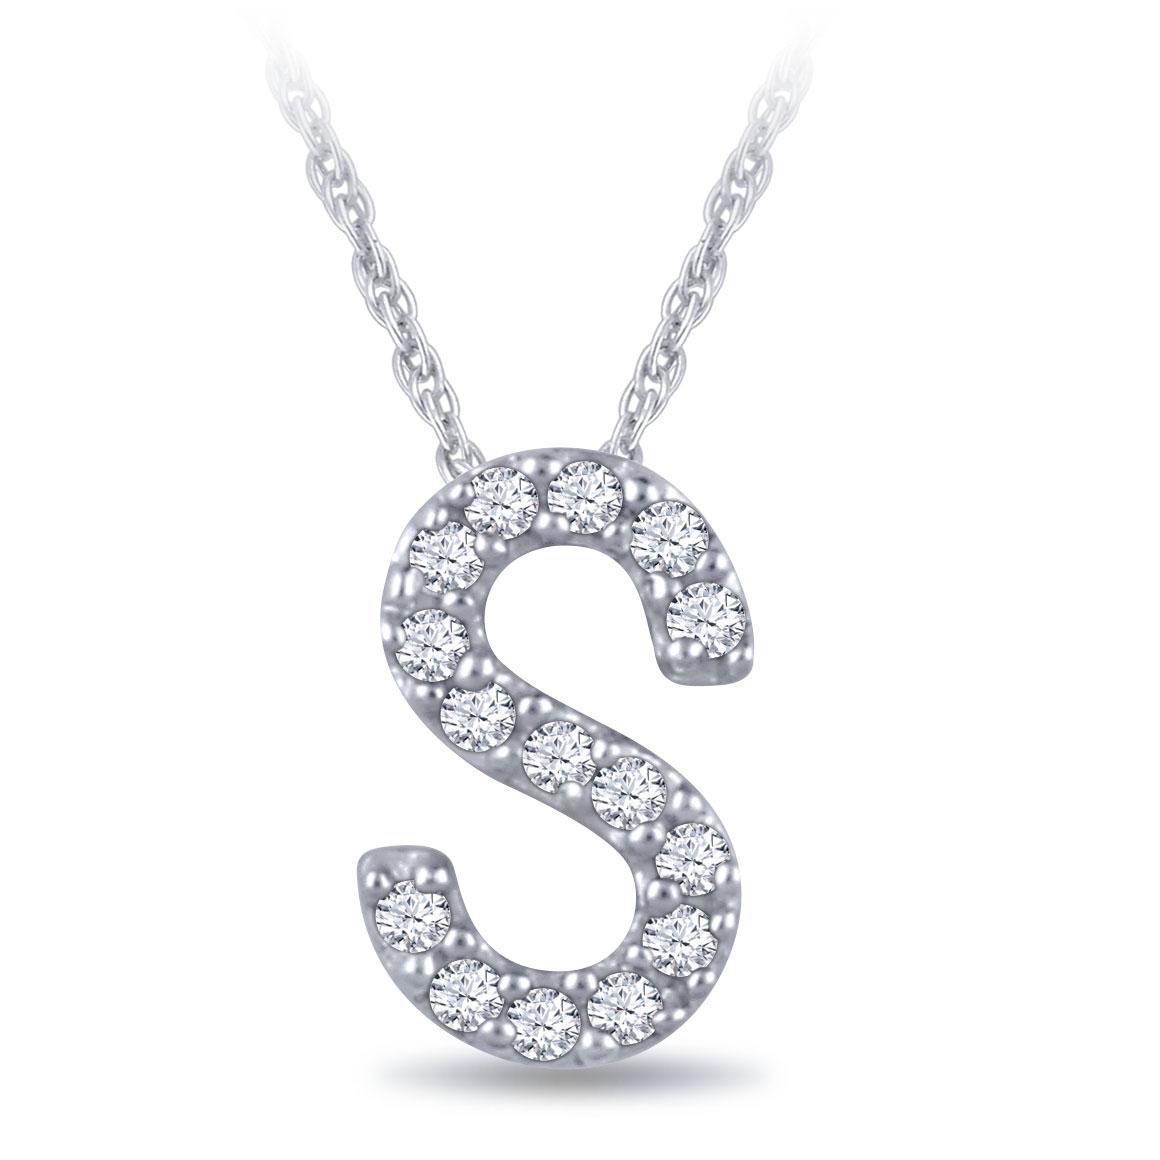 Diamond Initial Pendant 14k Letter S Ben Bridge Jeweler